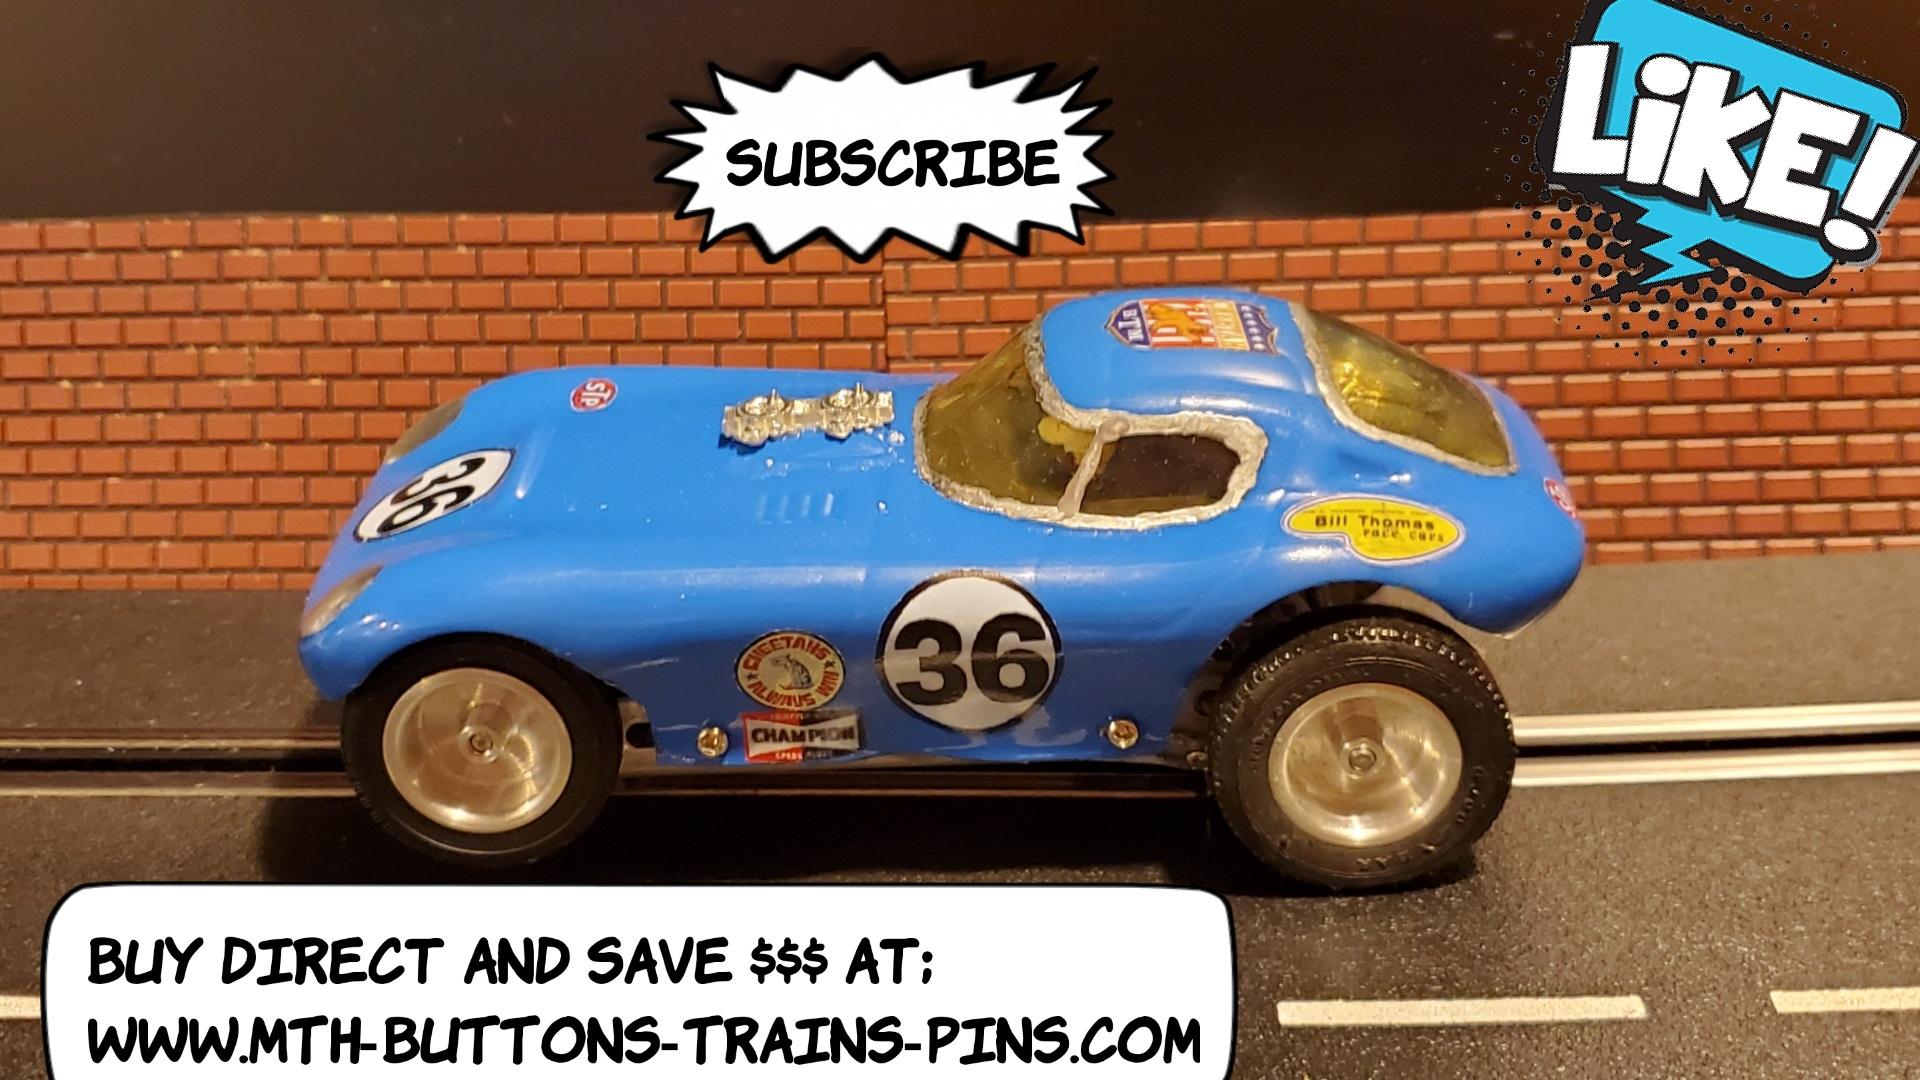 * SALE * AMT Bill Thomas Cheetah Racer Slot Car 1:24 Scale Blue Car 36